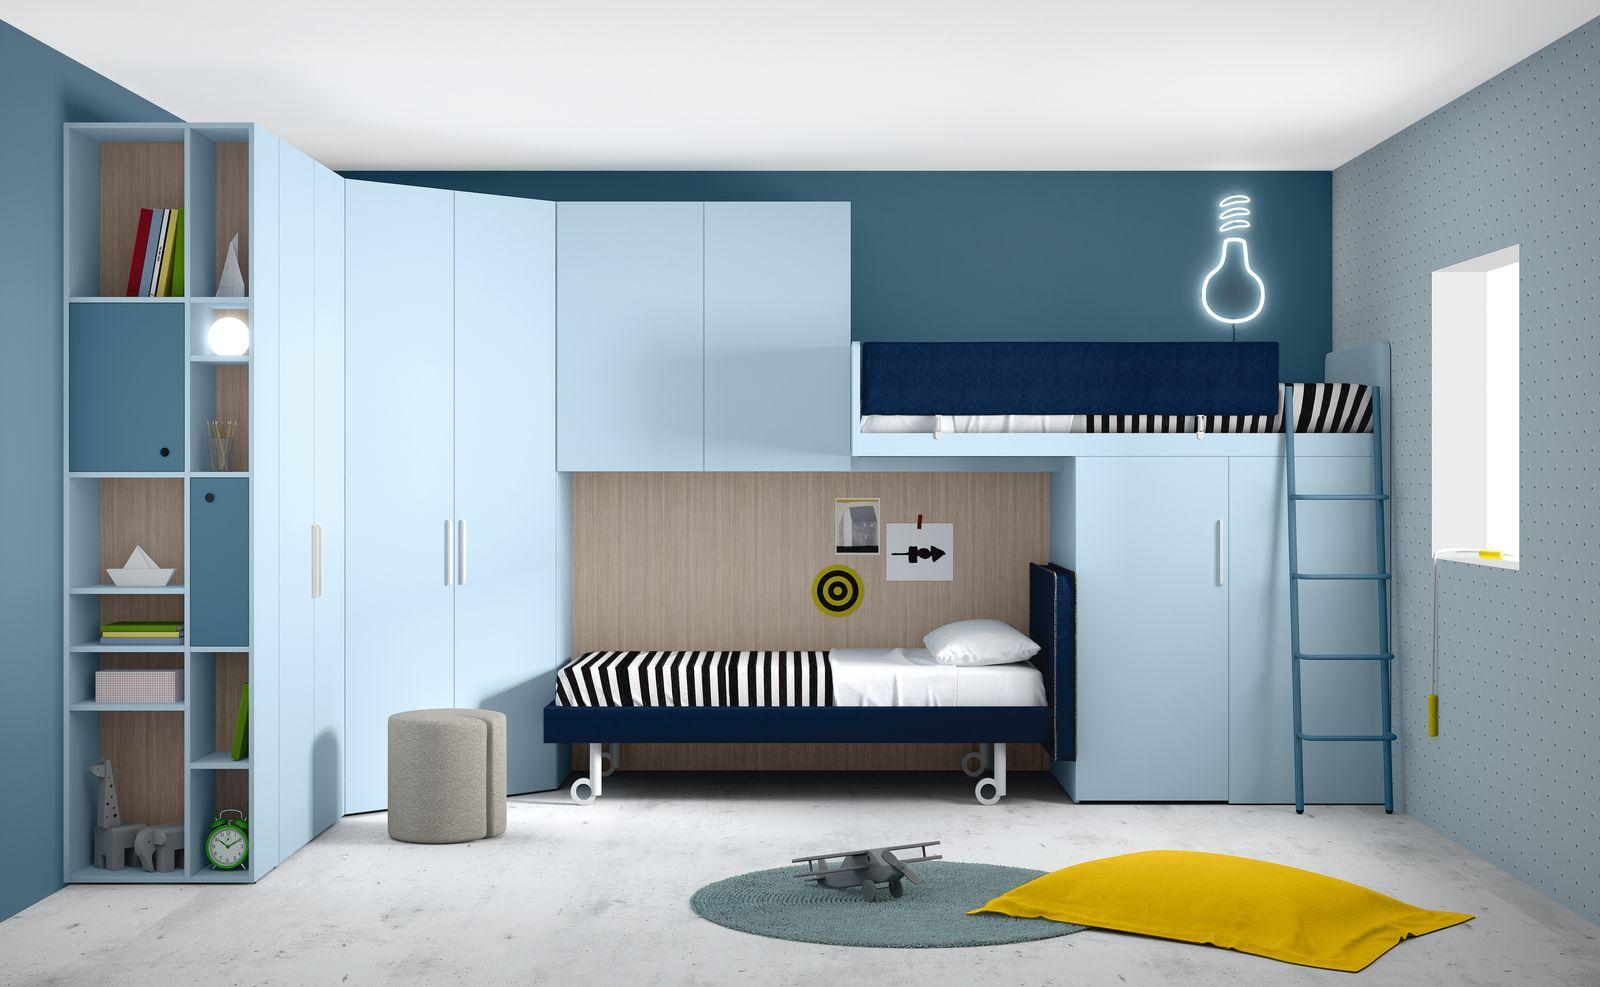 Camerette moderne soppalco Camerette, Letti loft, Camere